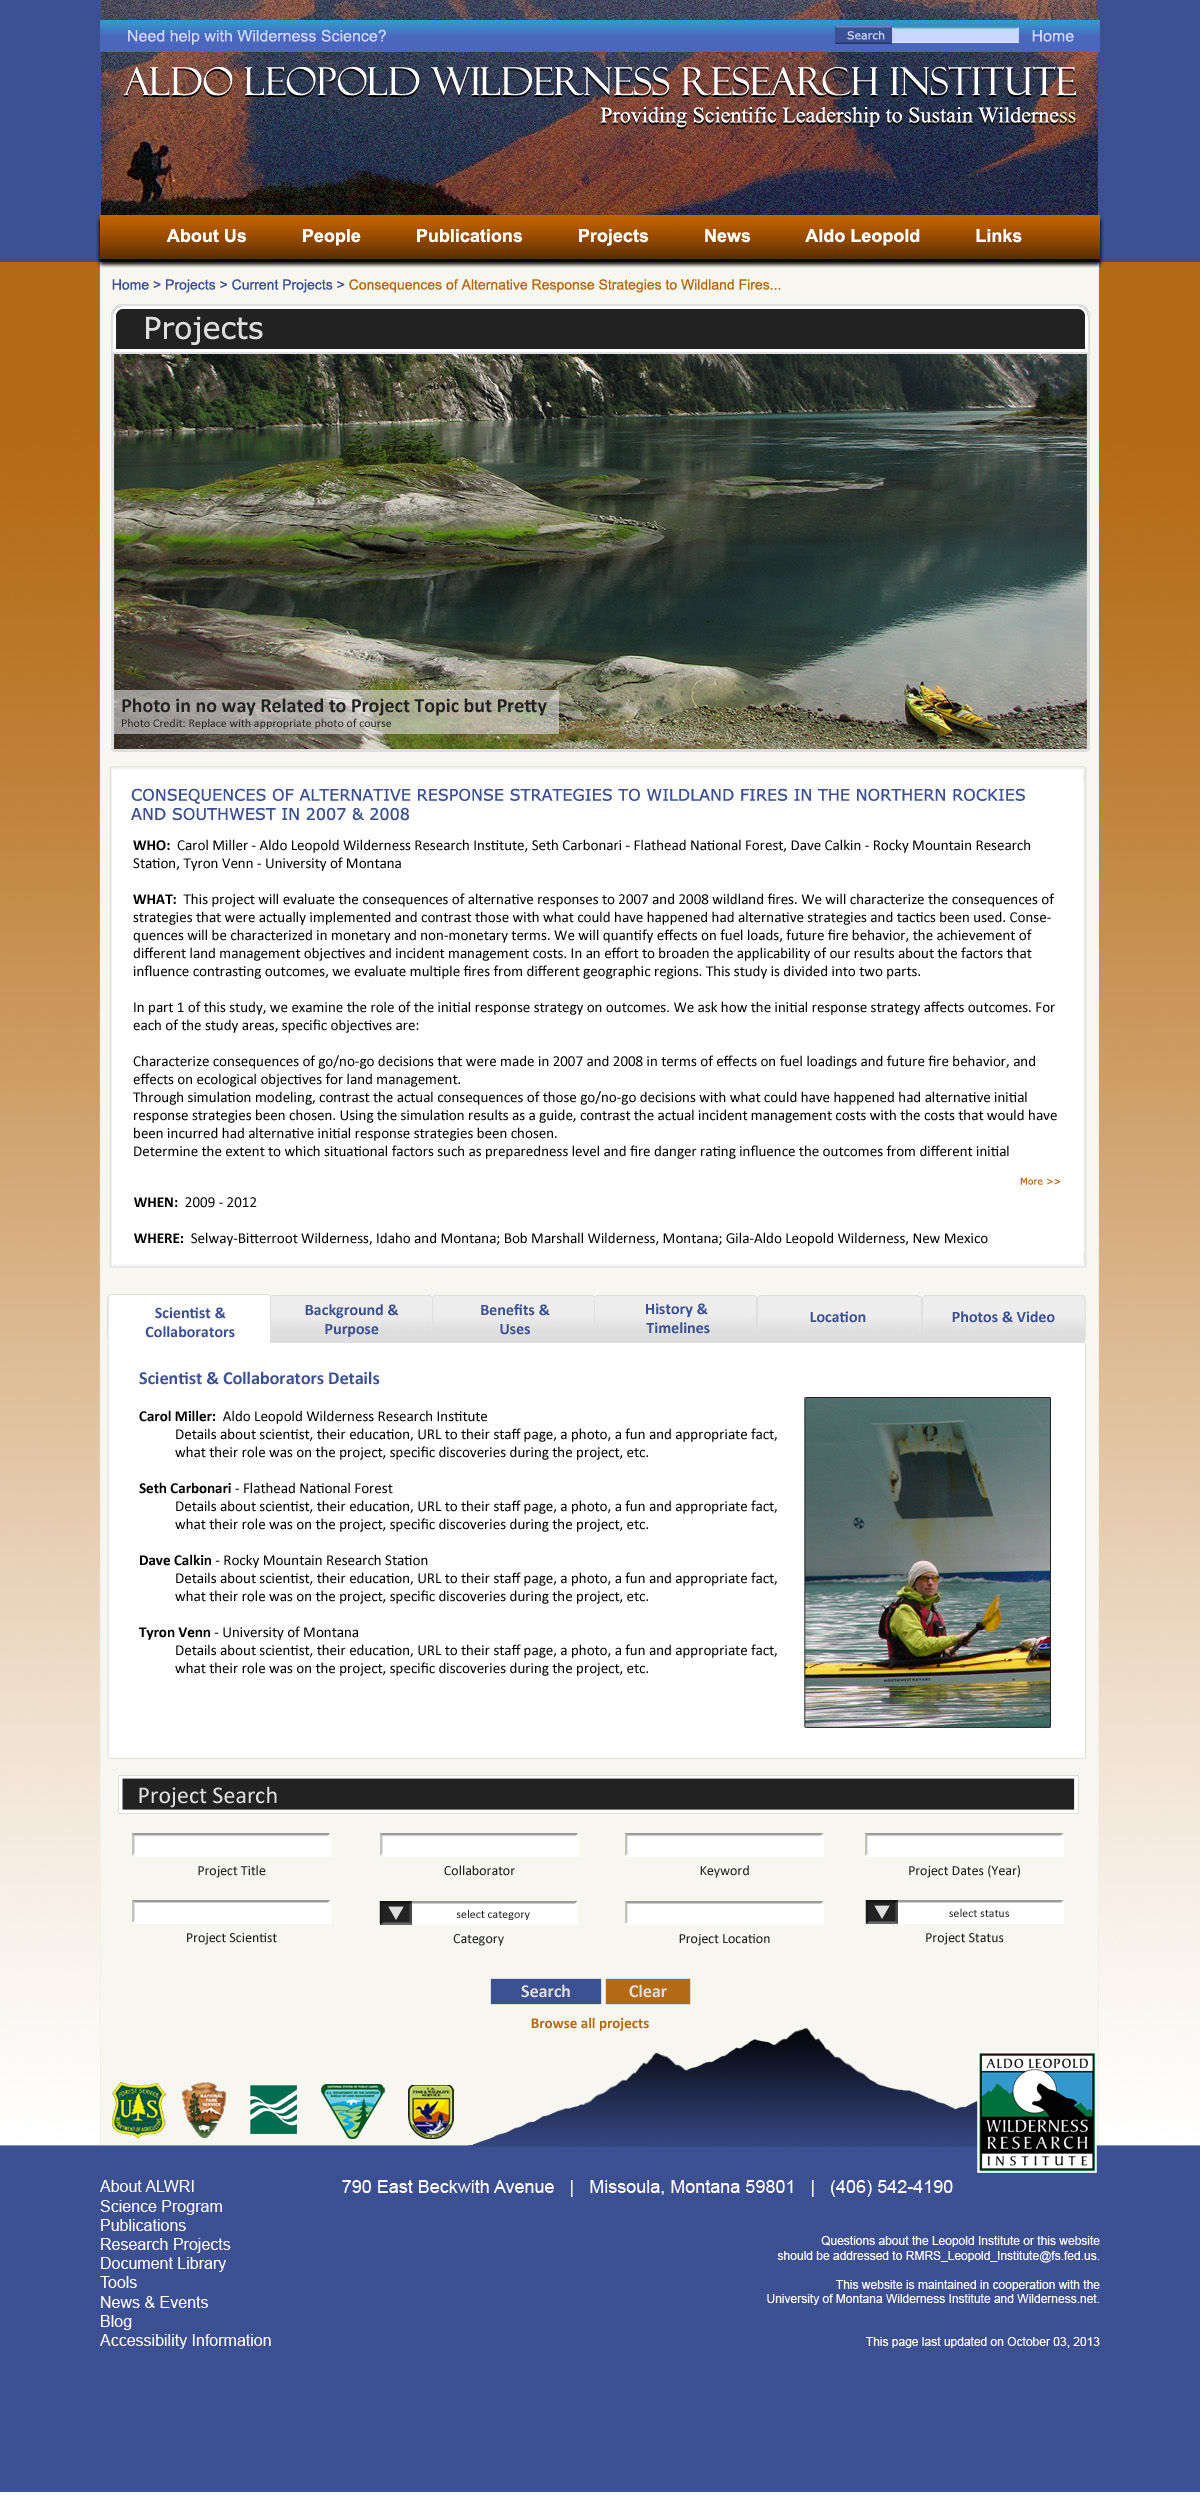 Website Design, Web Development, Graphic Design, Missoula Montana, Missoula MT, Denver Colorado, Denver CO, Drupal, SQL, PHP